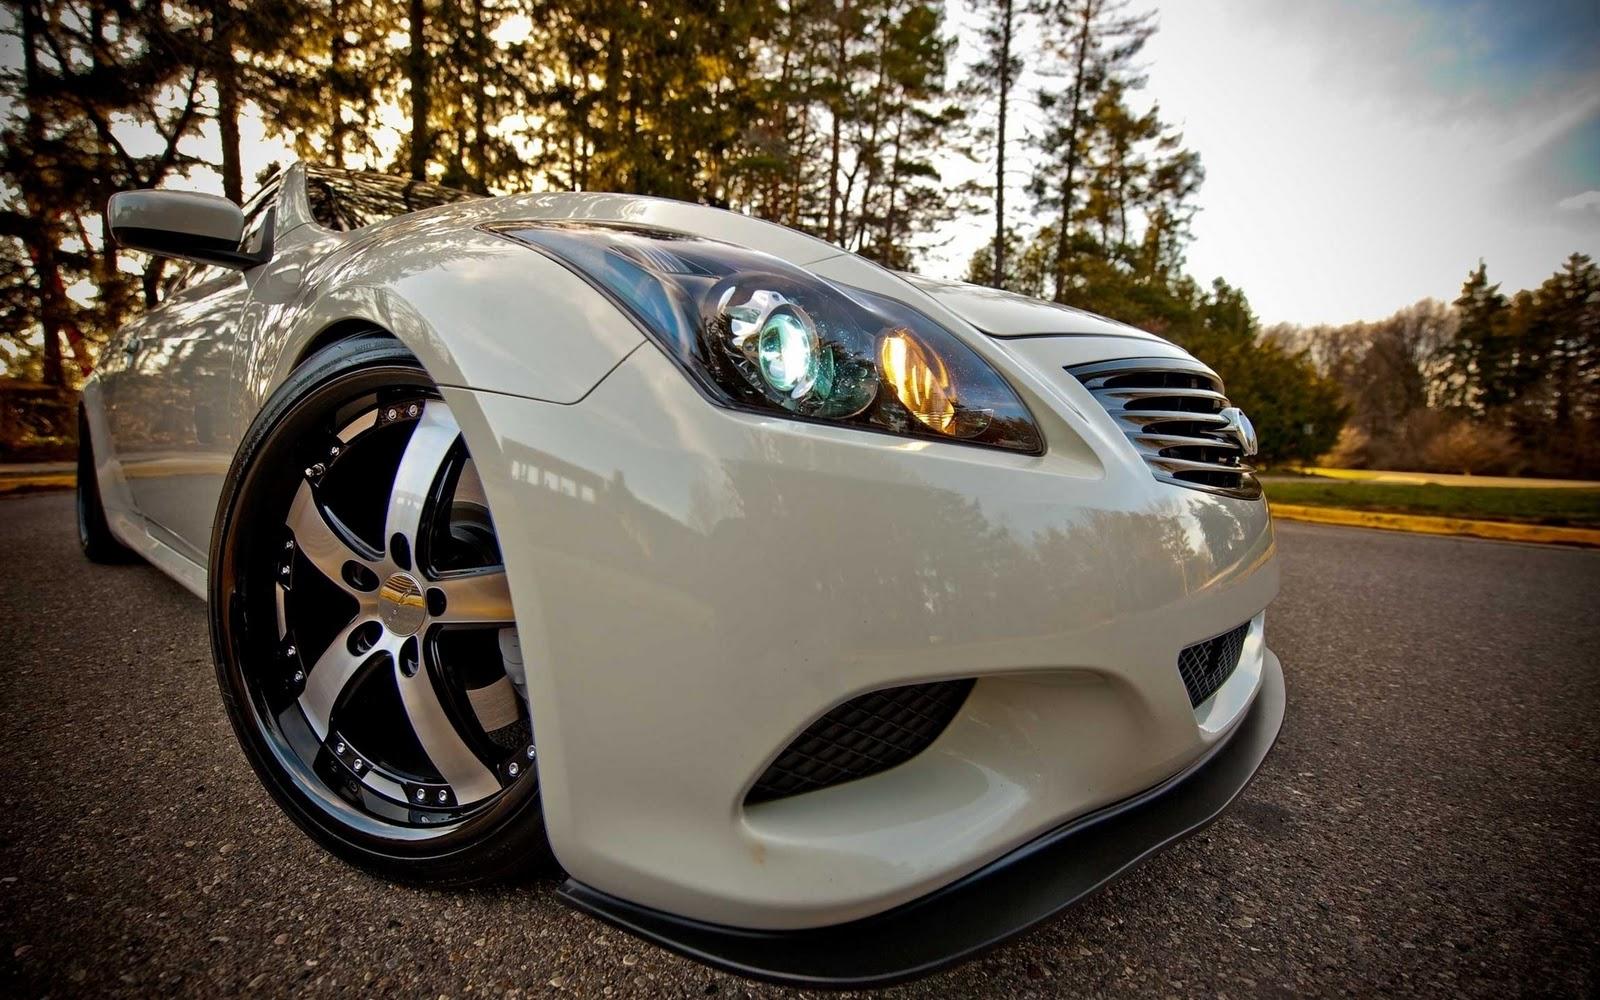 White car Desktop wallpaper 2012 En Güzel HD Araba Resimleri indir